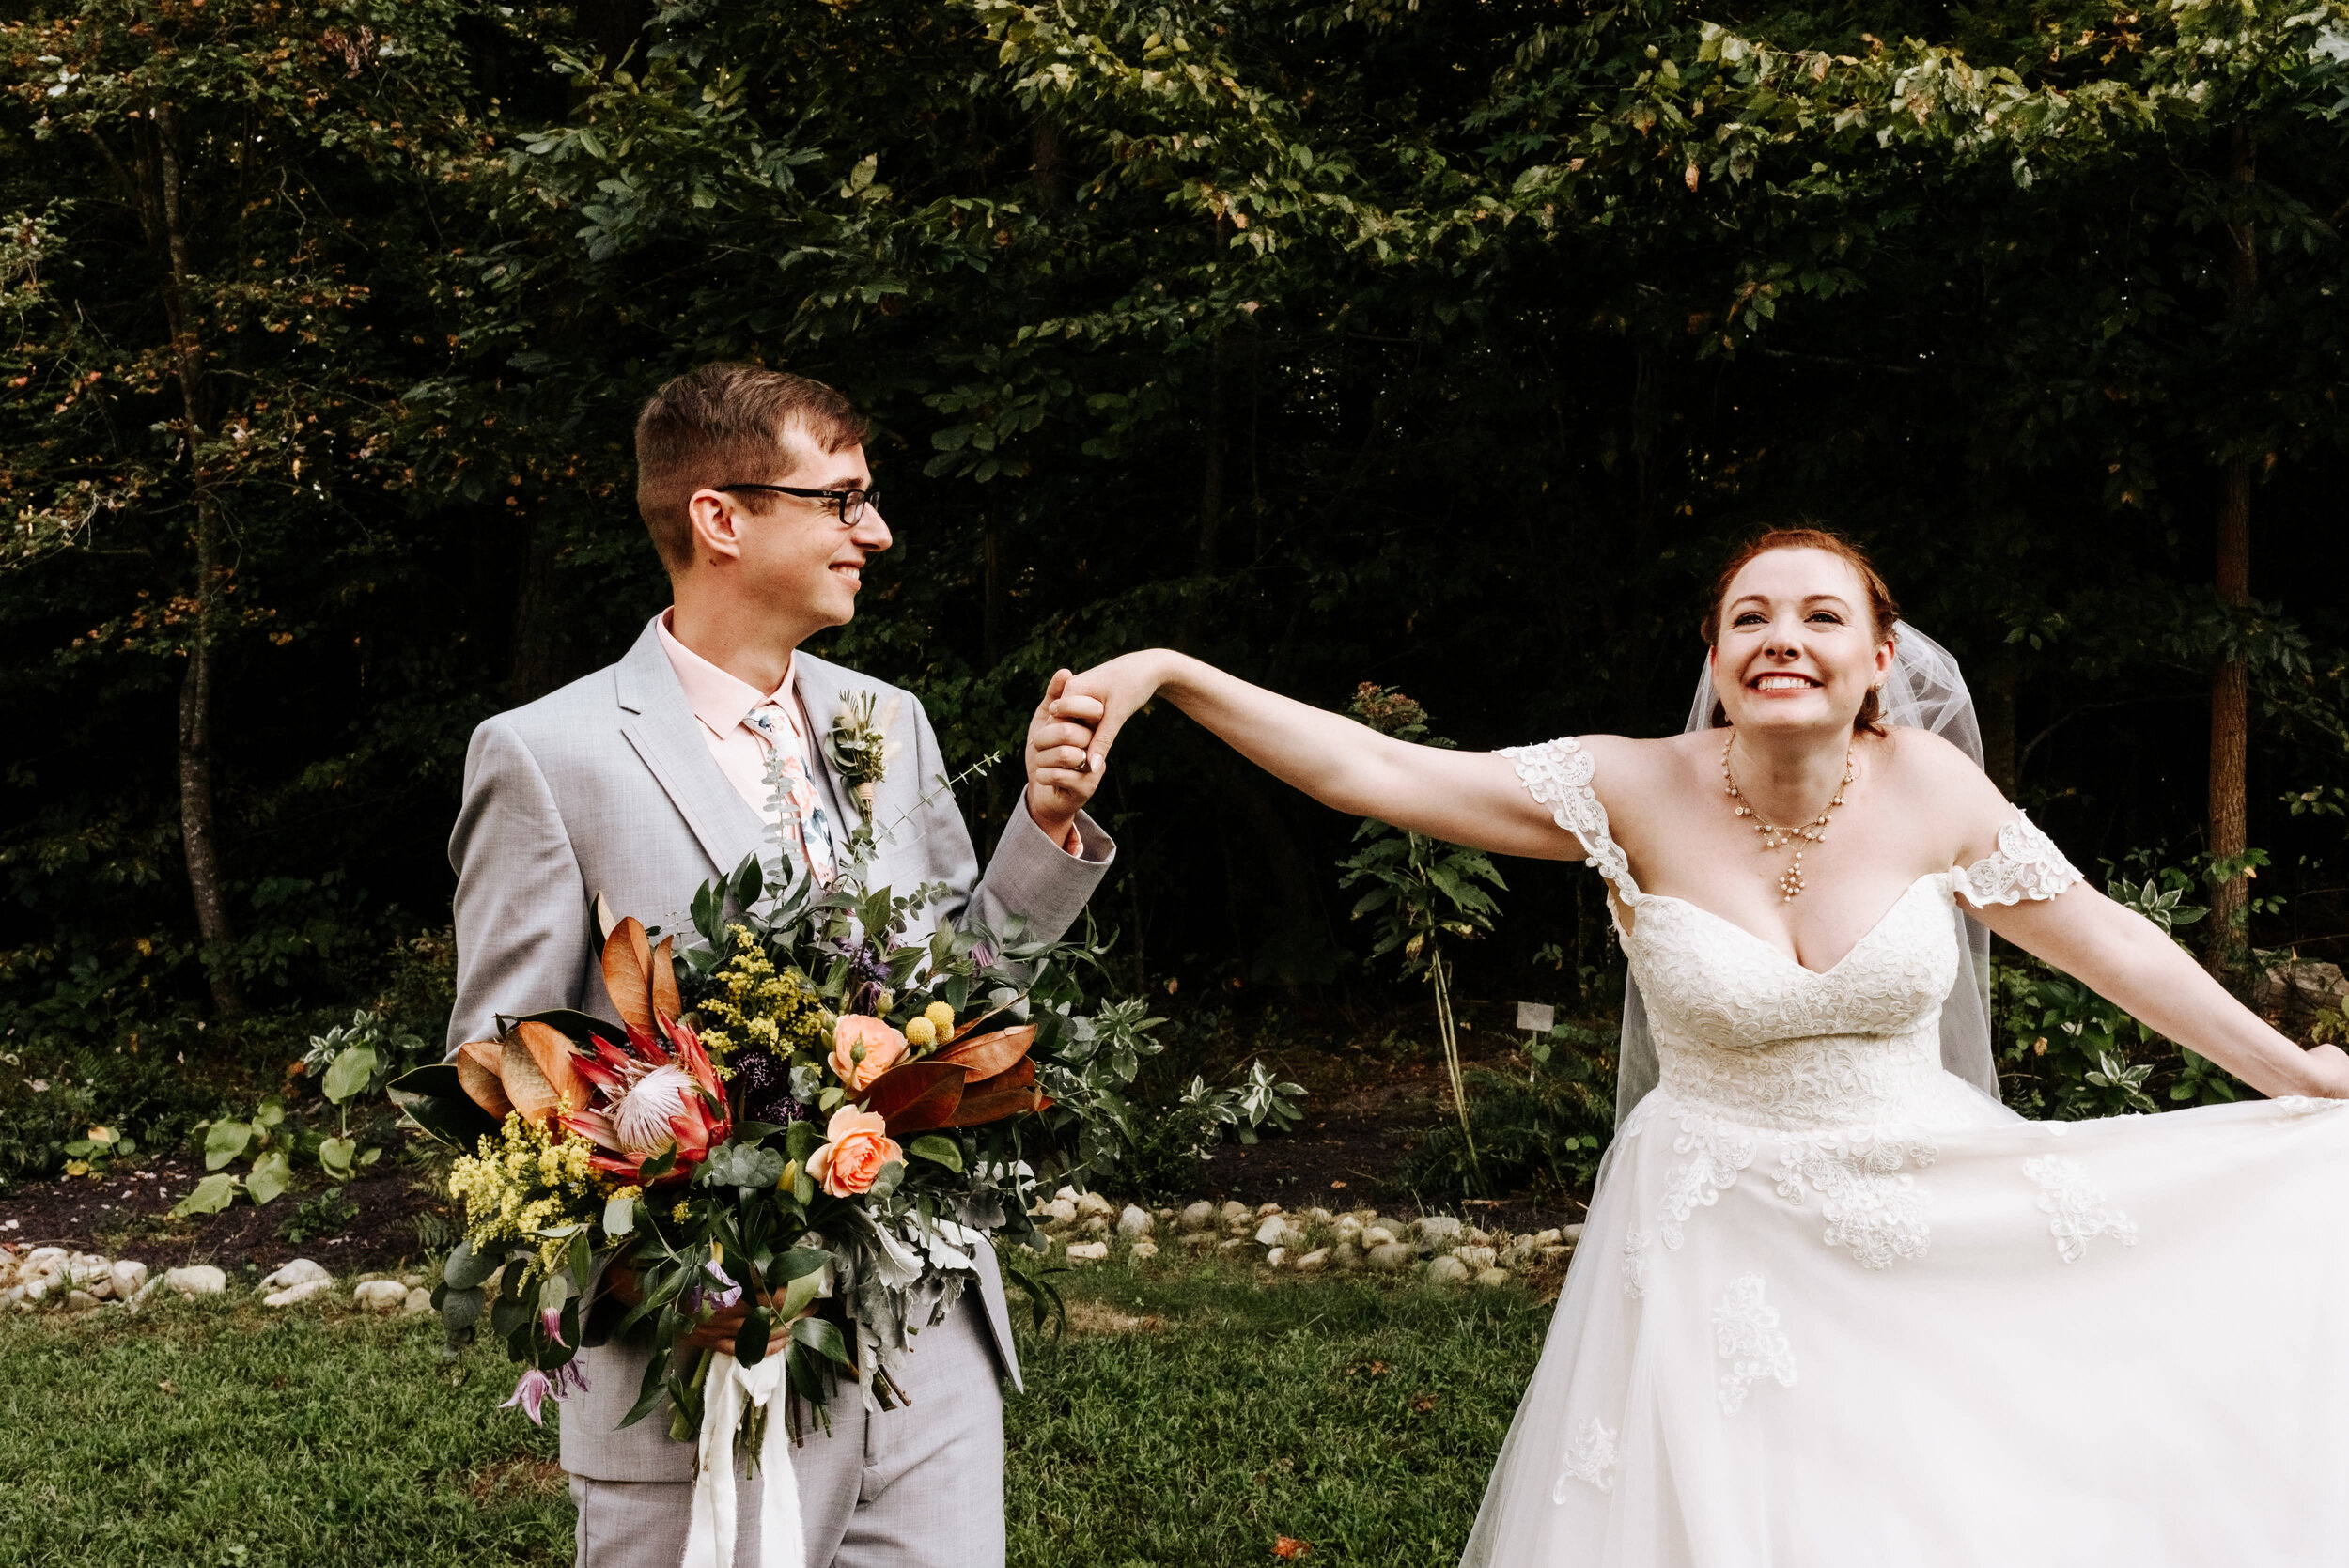 Rachel_David_Wedding_Richmond_Virginia_Photography_by_V_43.jpg